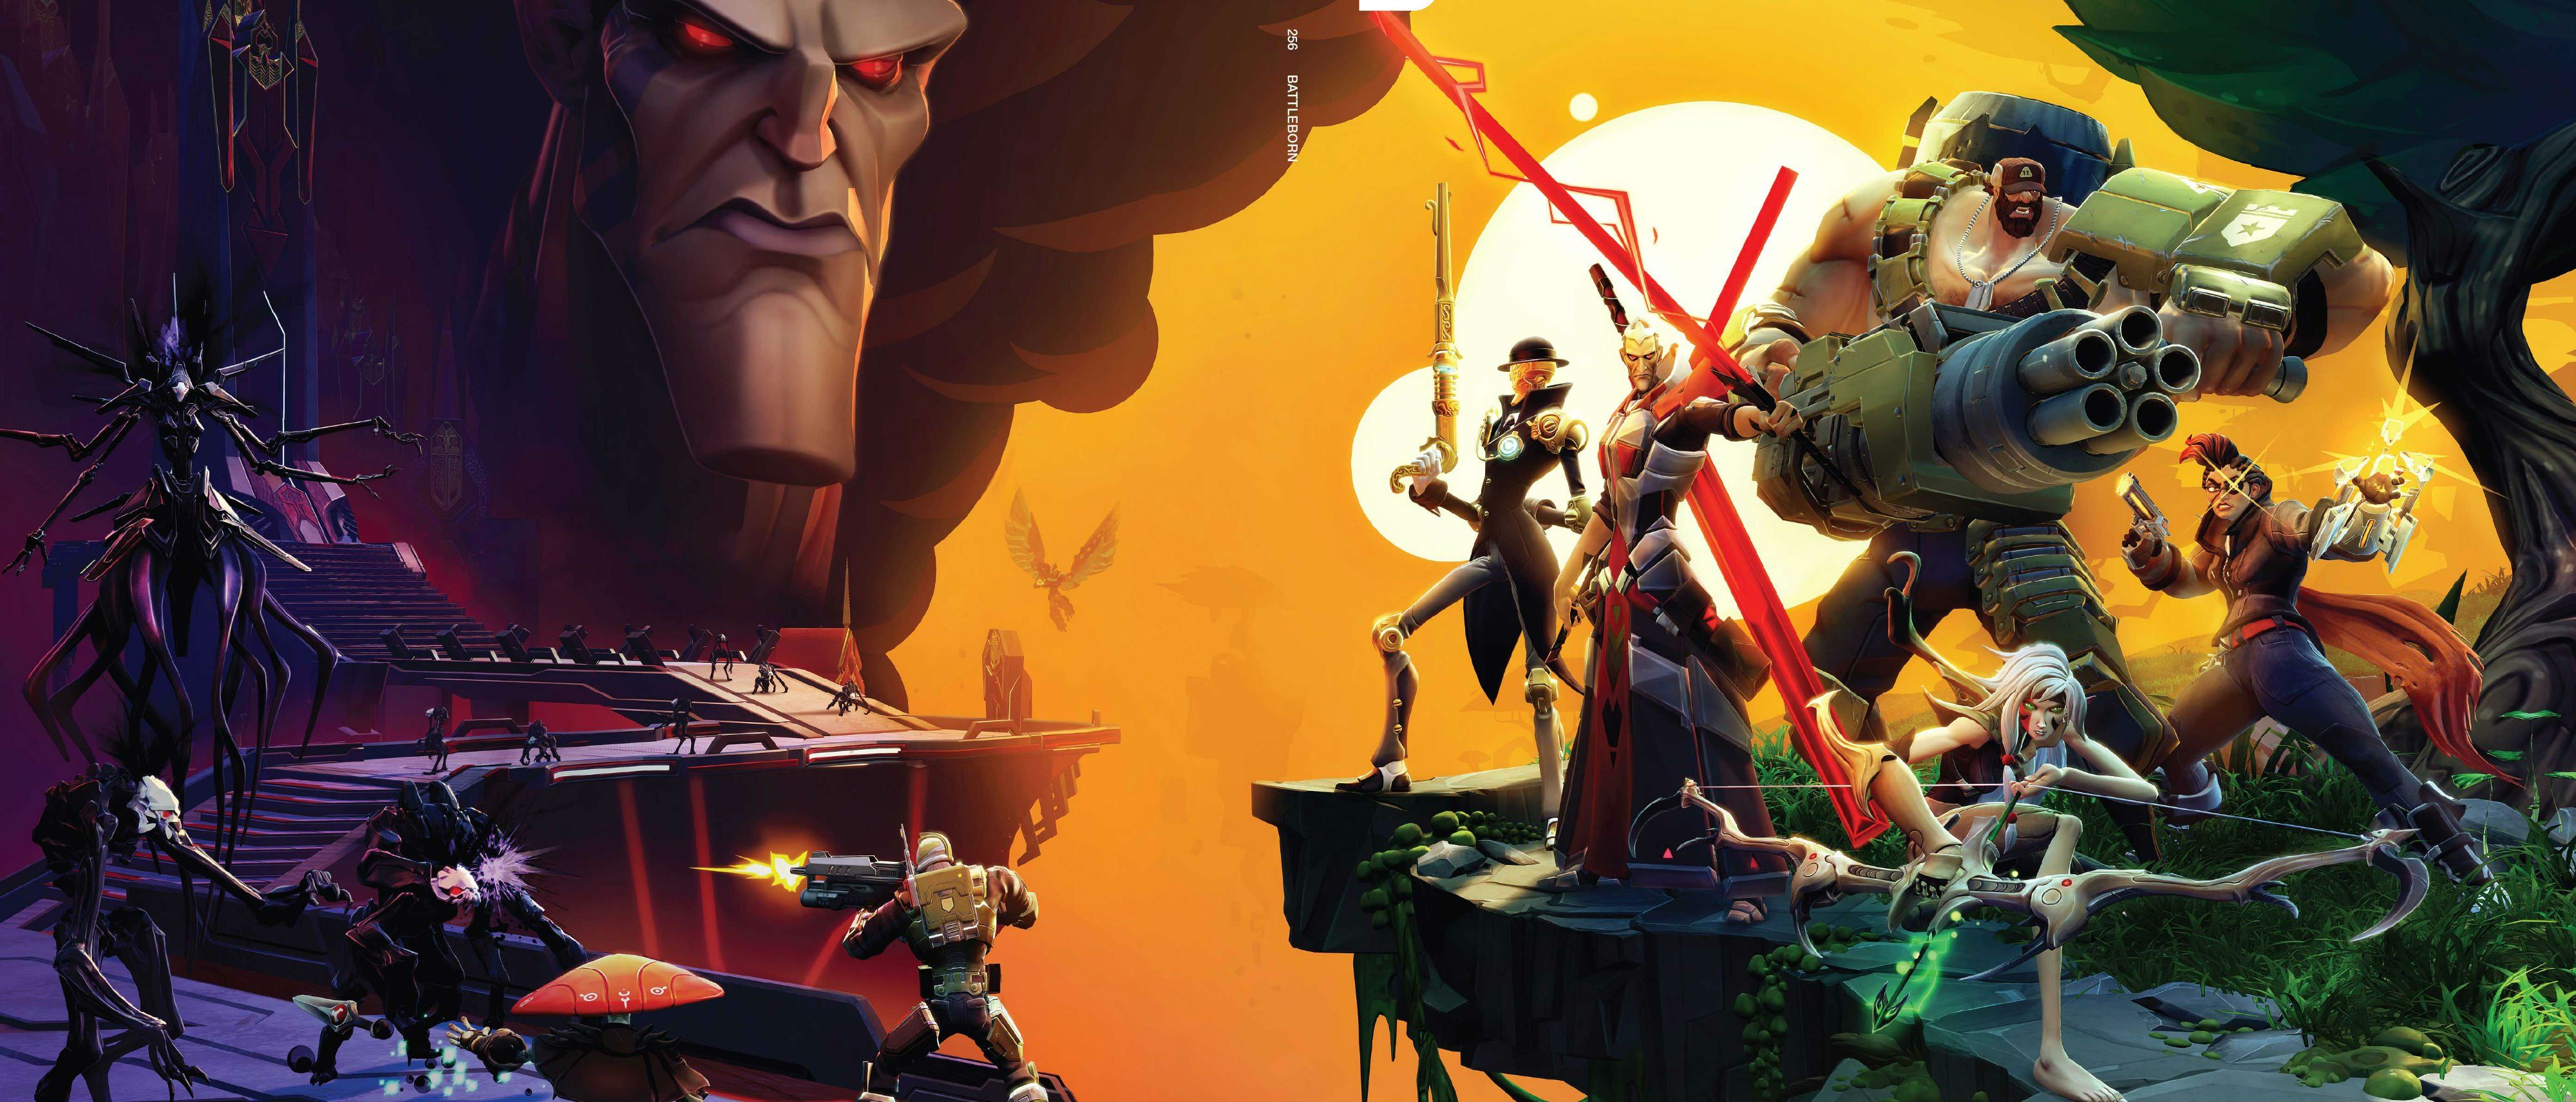 Battleborn game wallpaper hd download for lapotp and pc hd battleborn game wallpaper hd download for lapotp and pc voltagebd Images